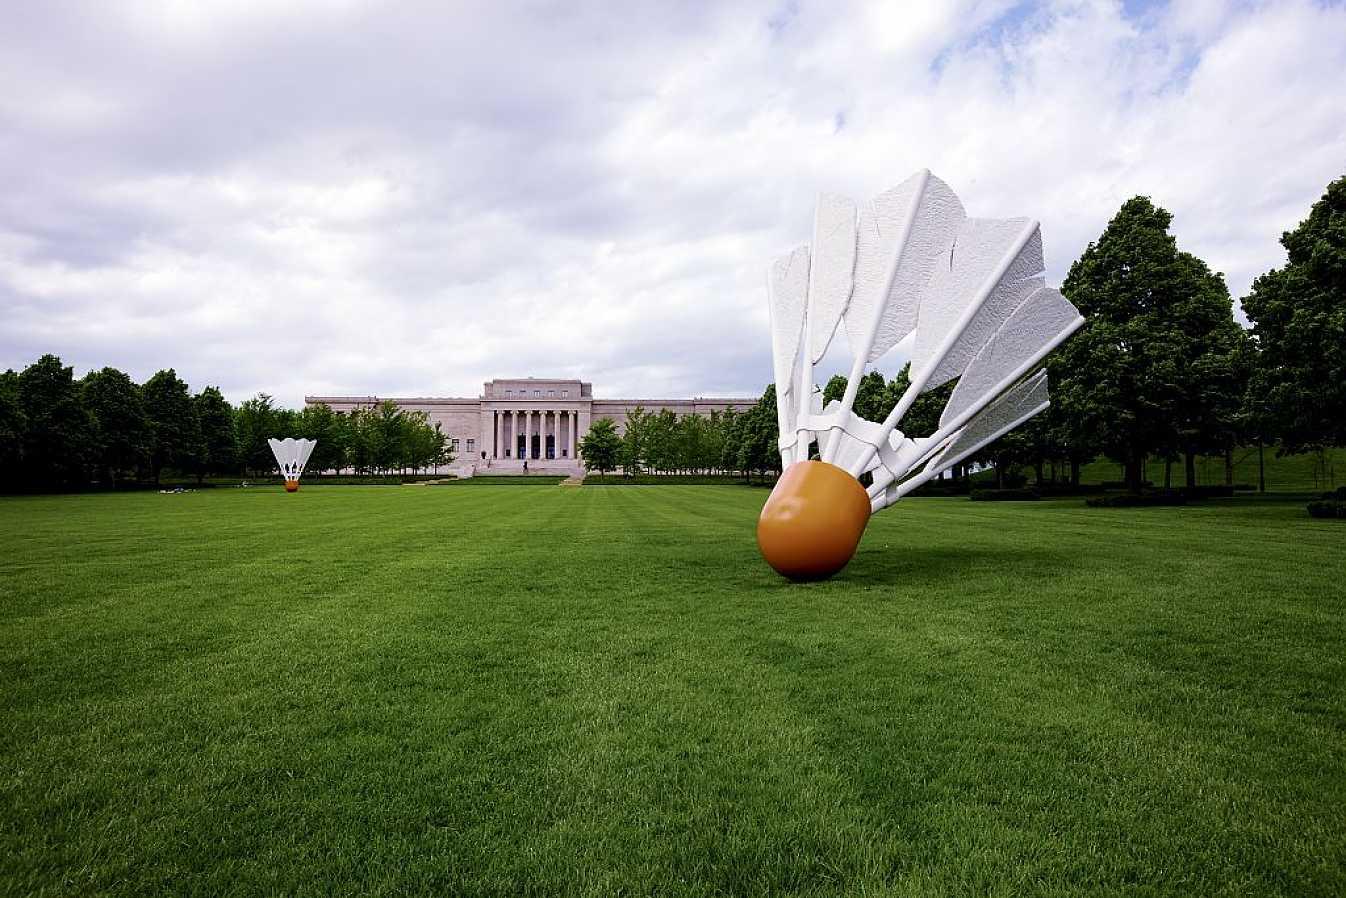 Nelson Atkins Art Museum, Kansas City, Missouri